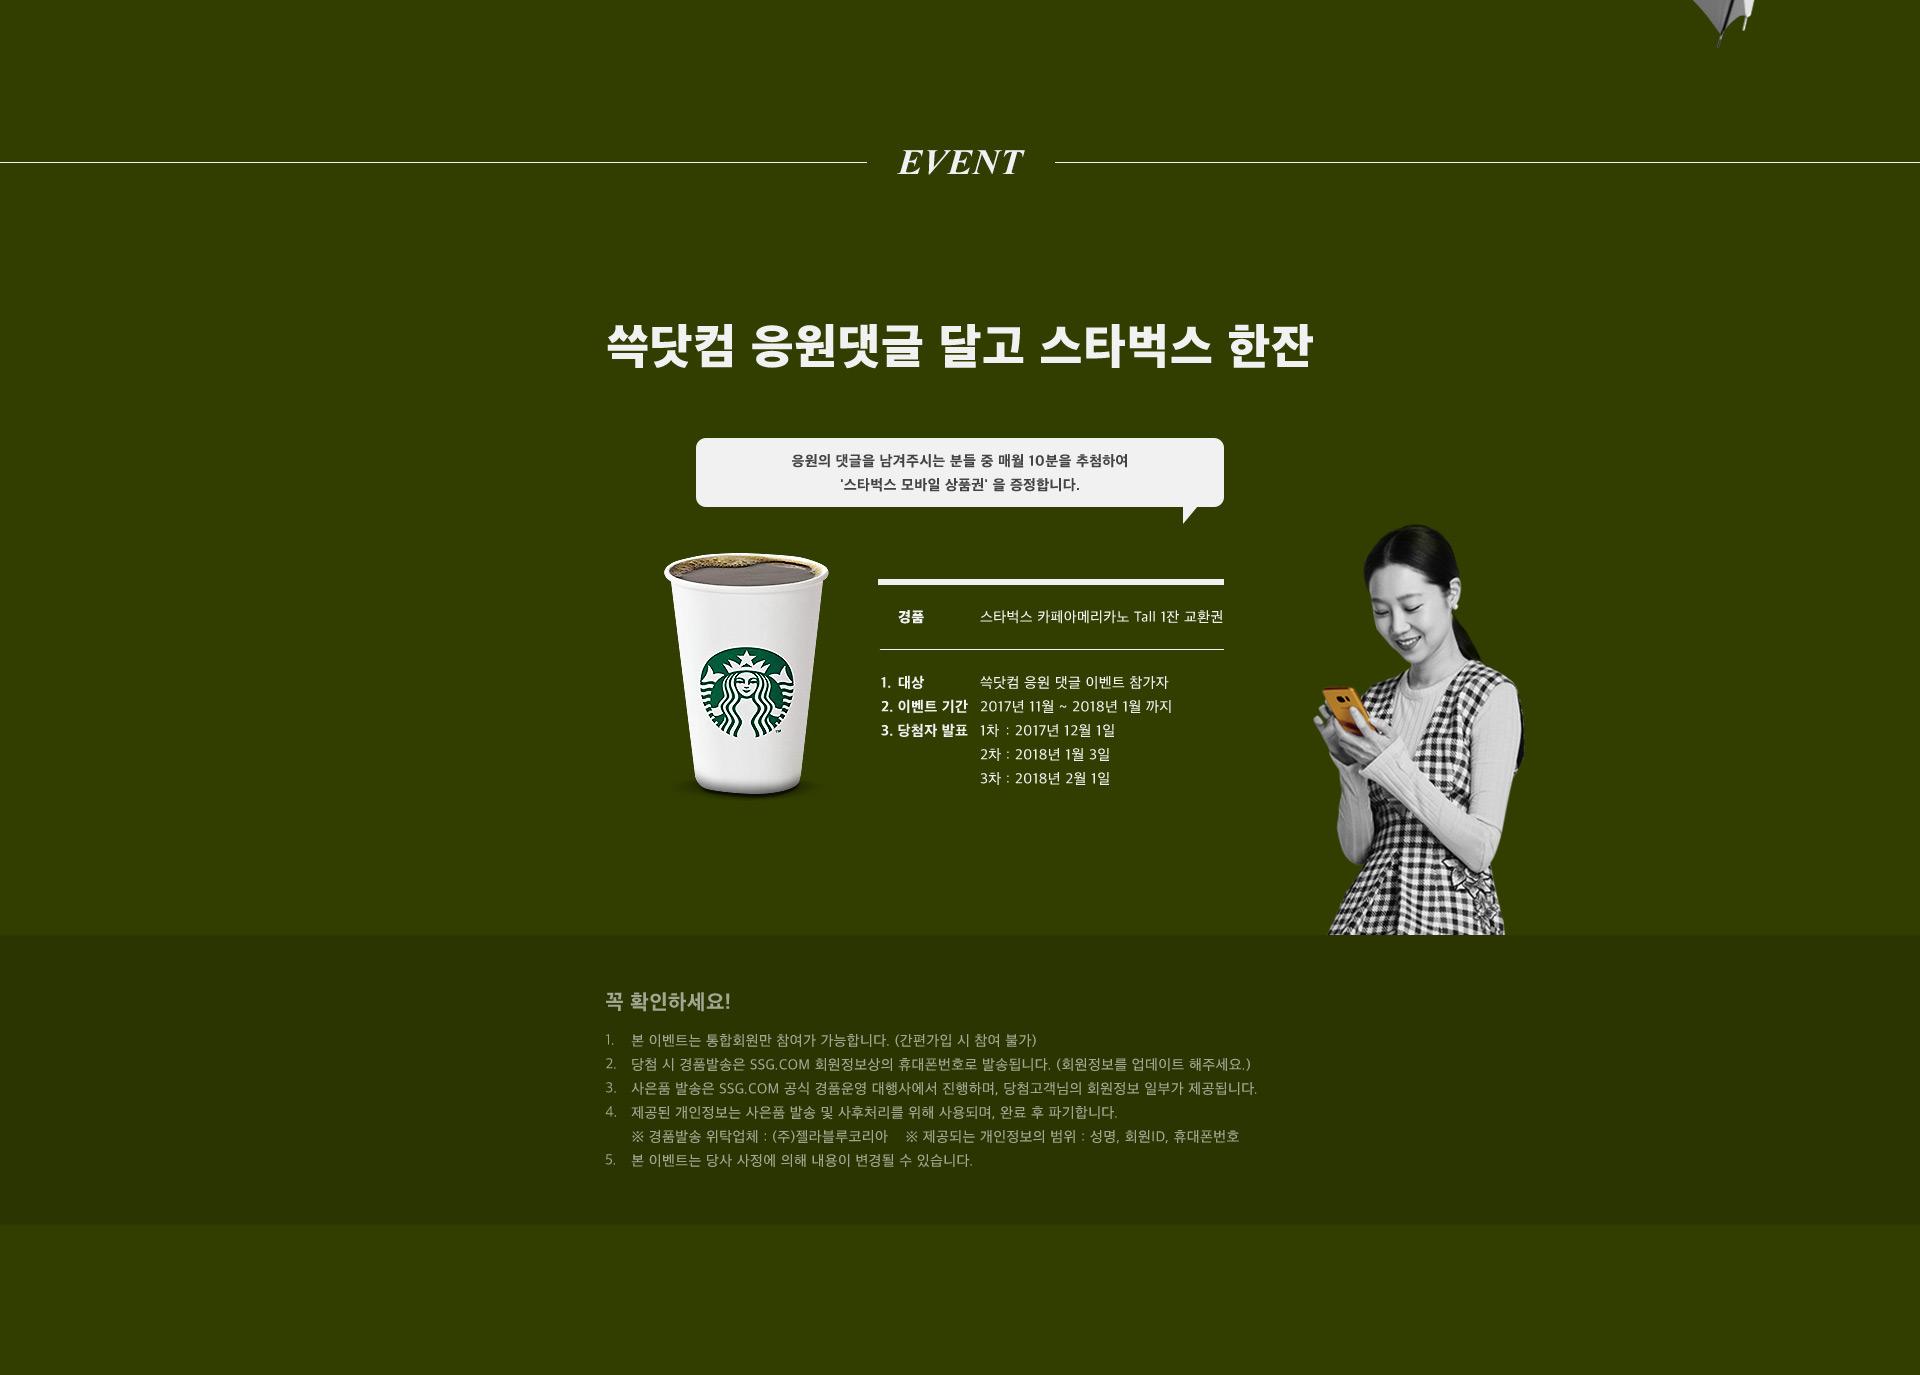 EVENT 쓱닷컴 응원댓글 달고 스타벅스 한잔